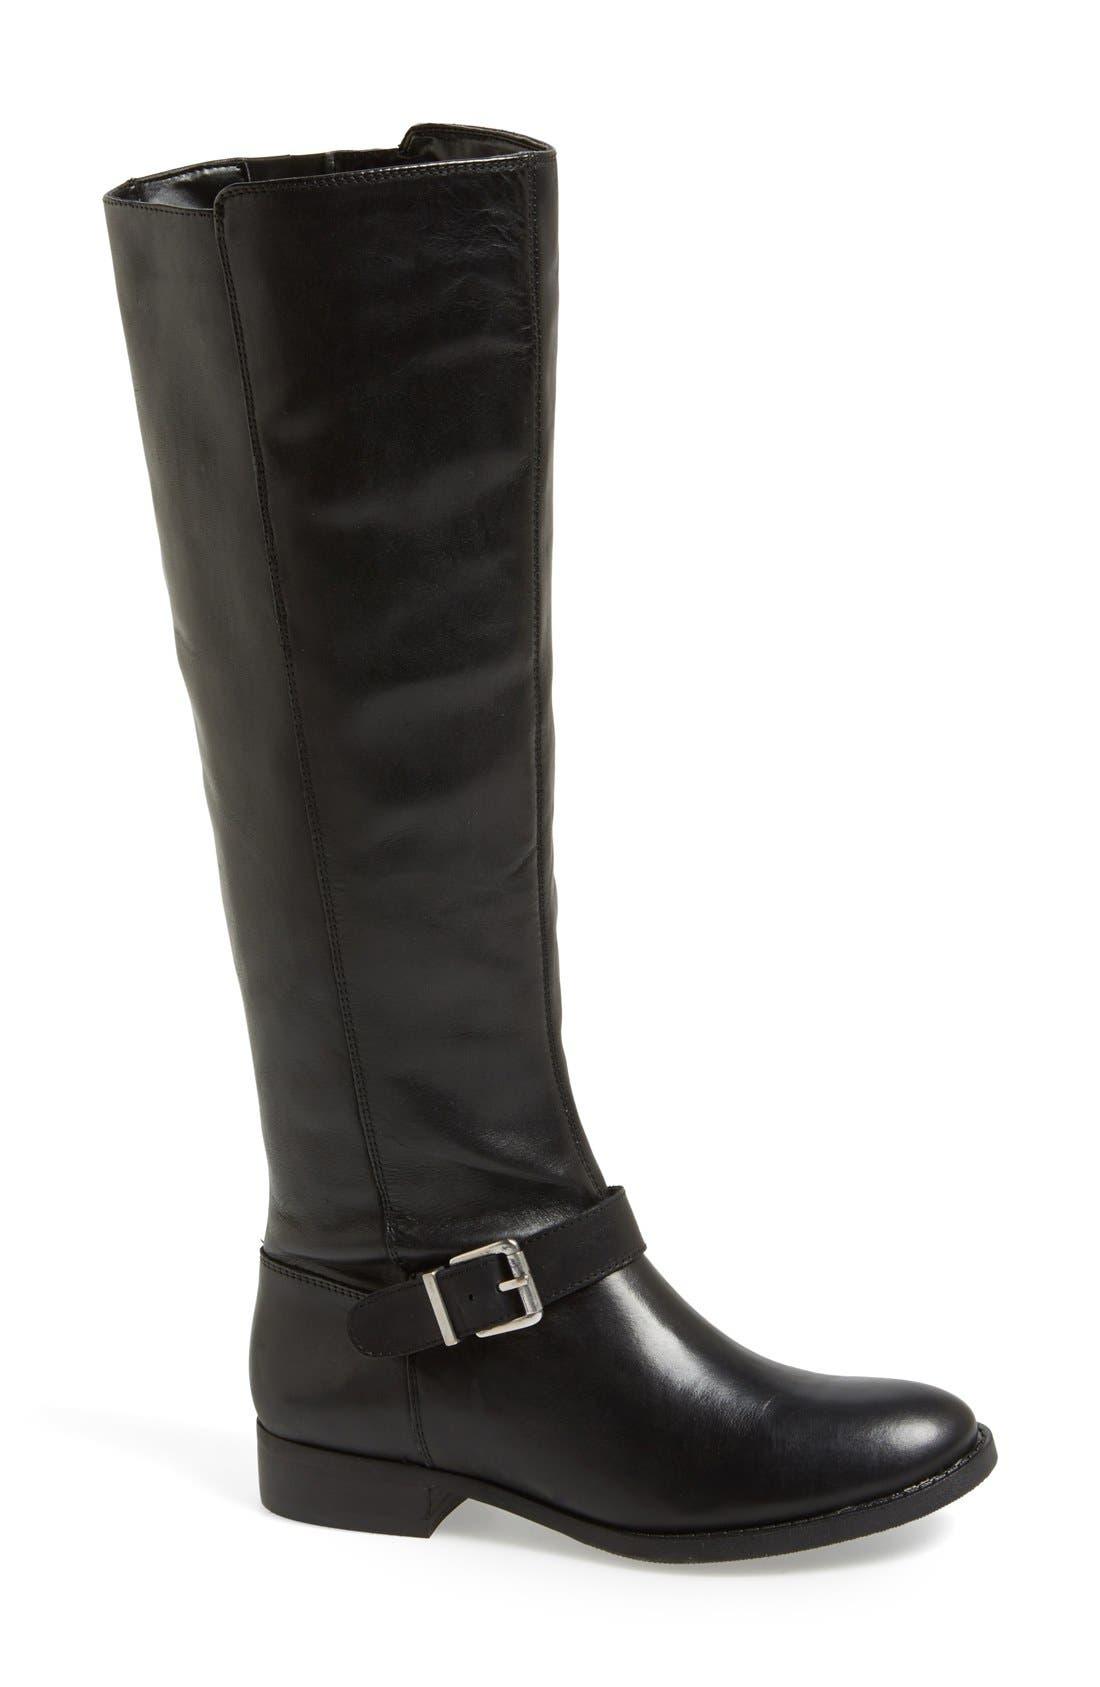 Main Image - Sole Society 'Shineh' Riding Boot (Women)